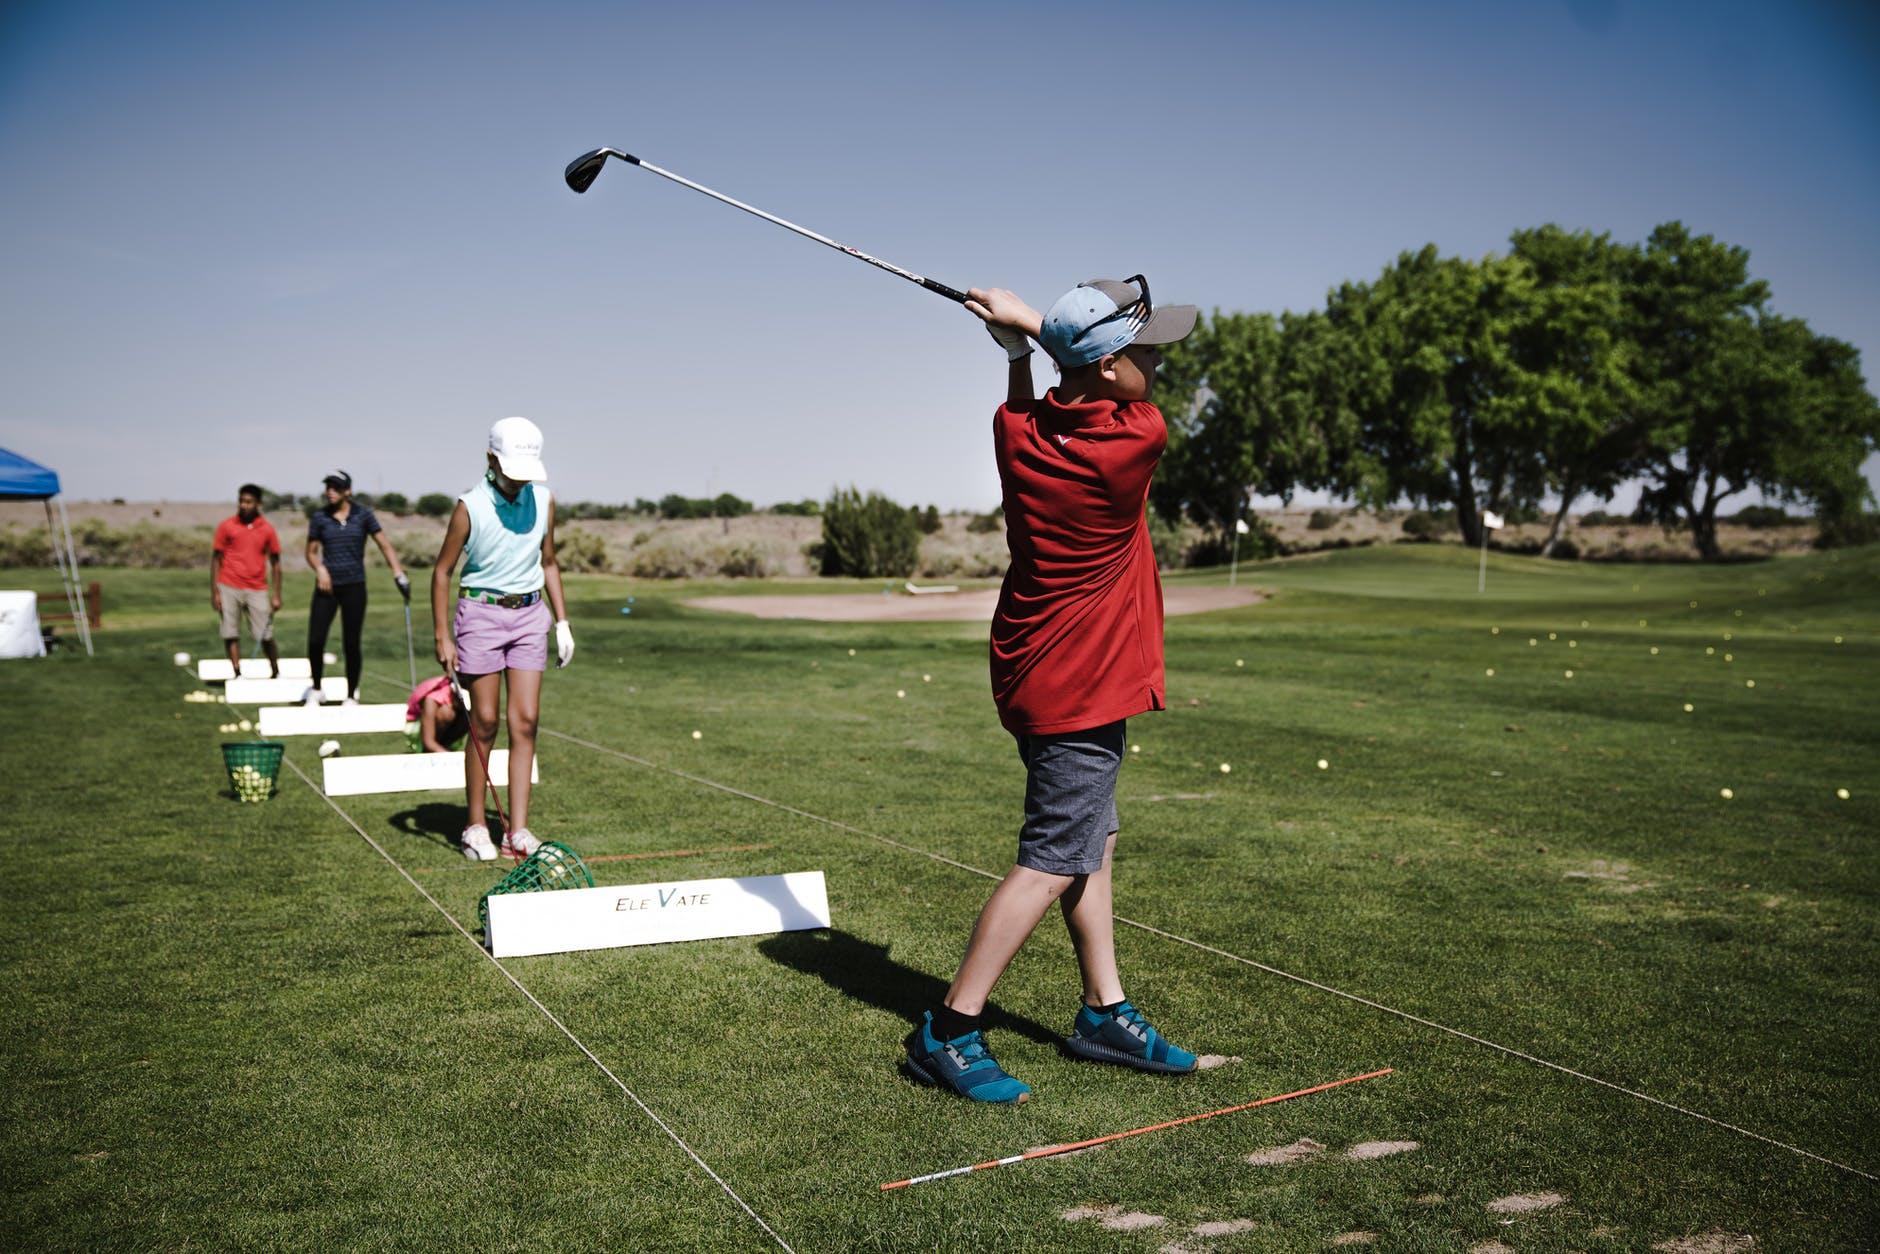 Benefits of swinging arizona